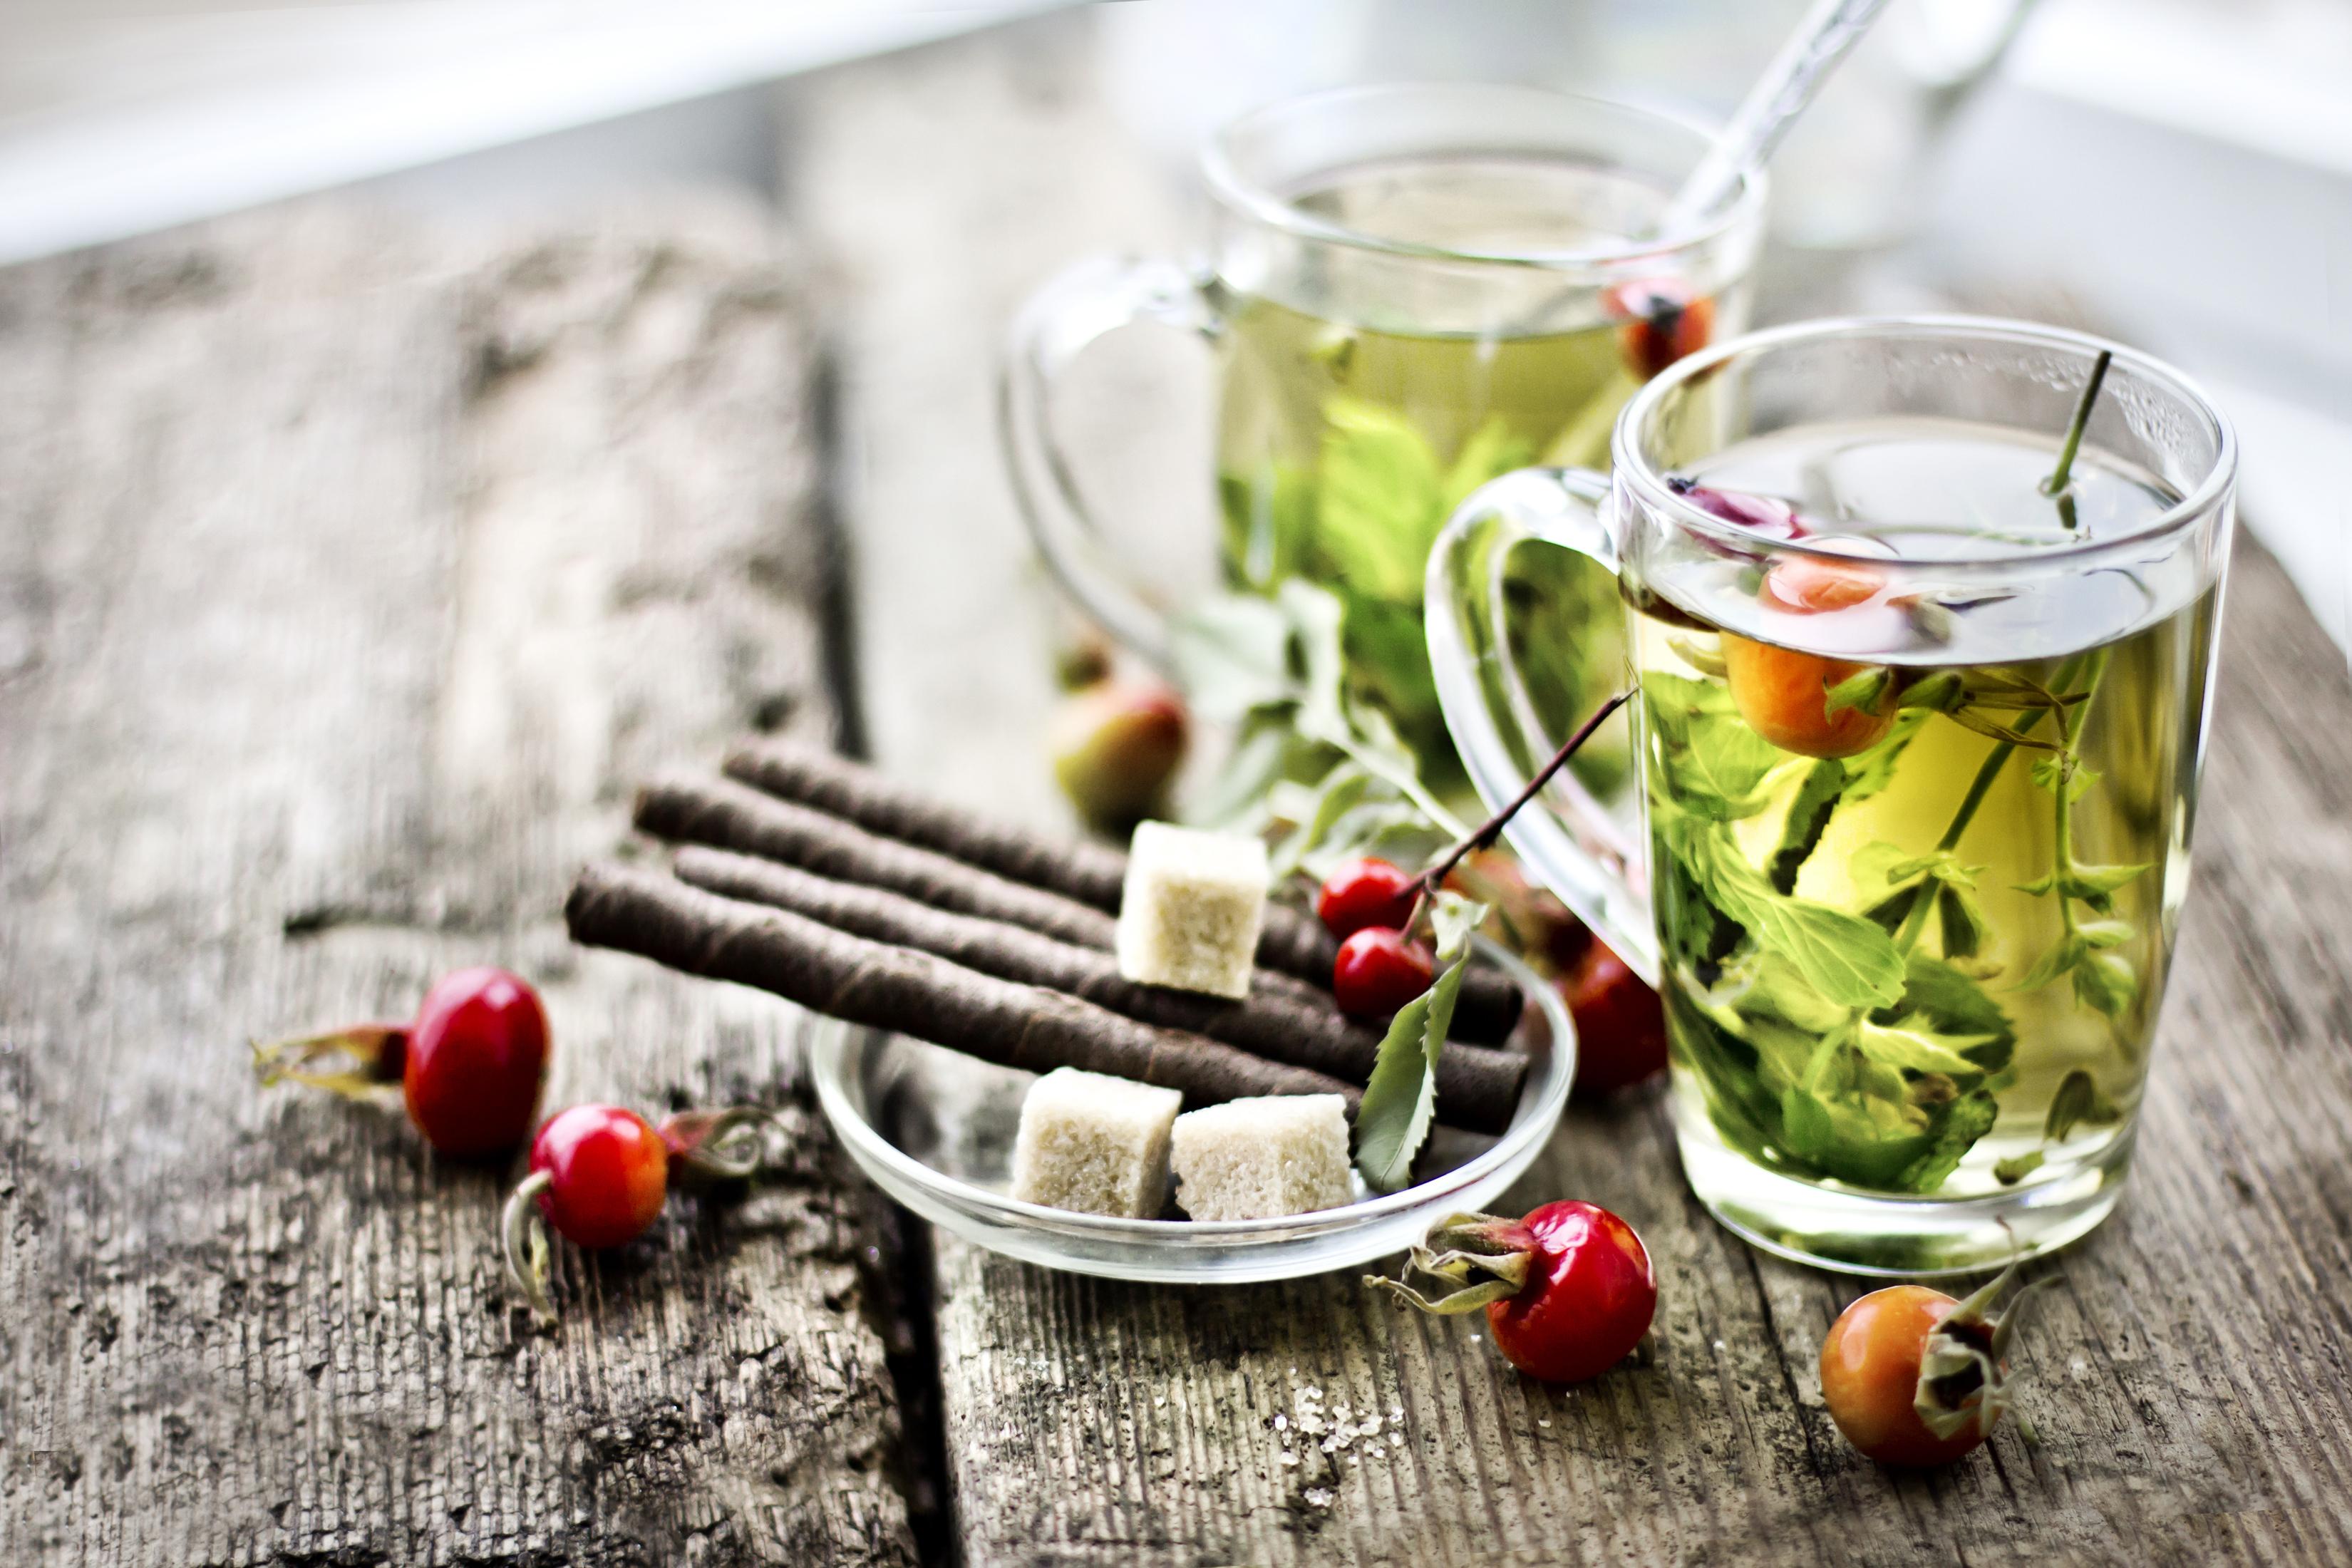 Evde Bitkisel Çay Paketleme İşi